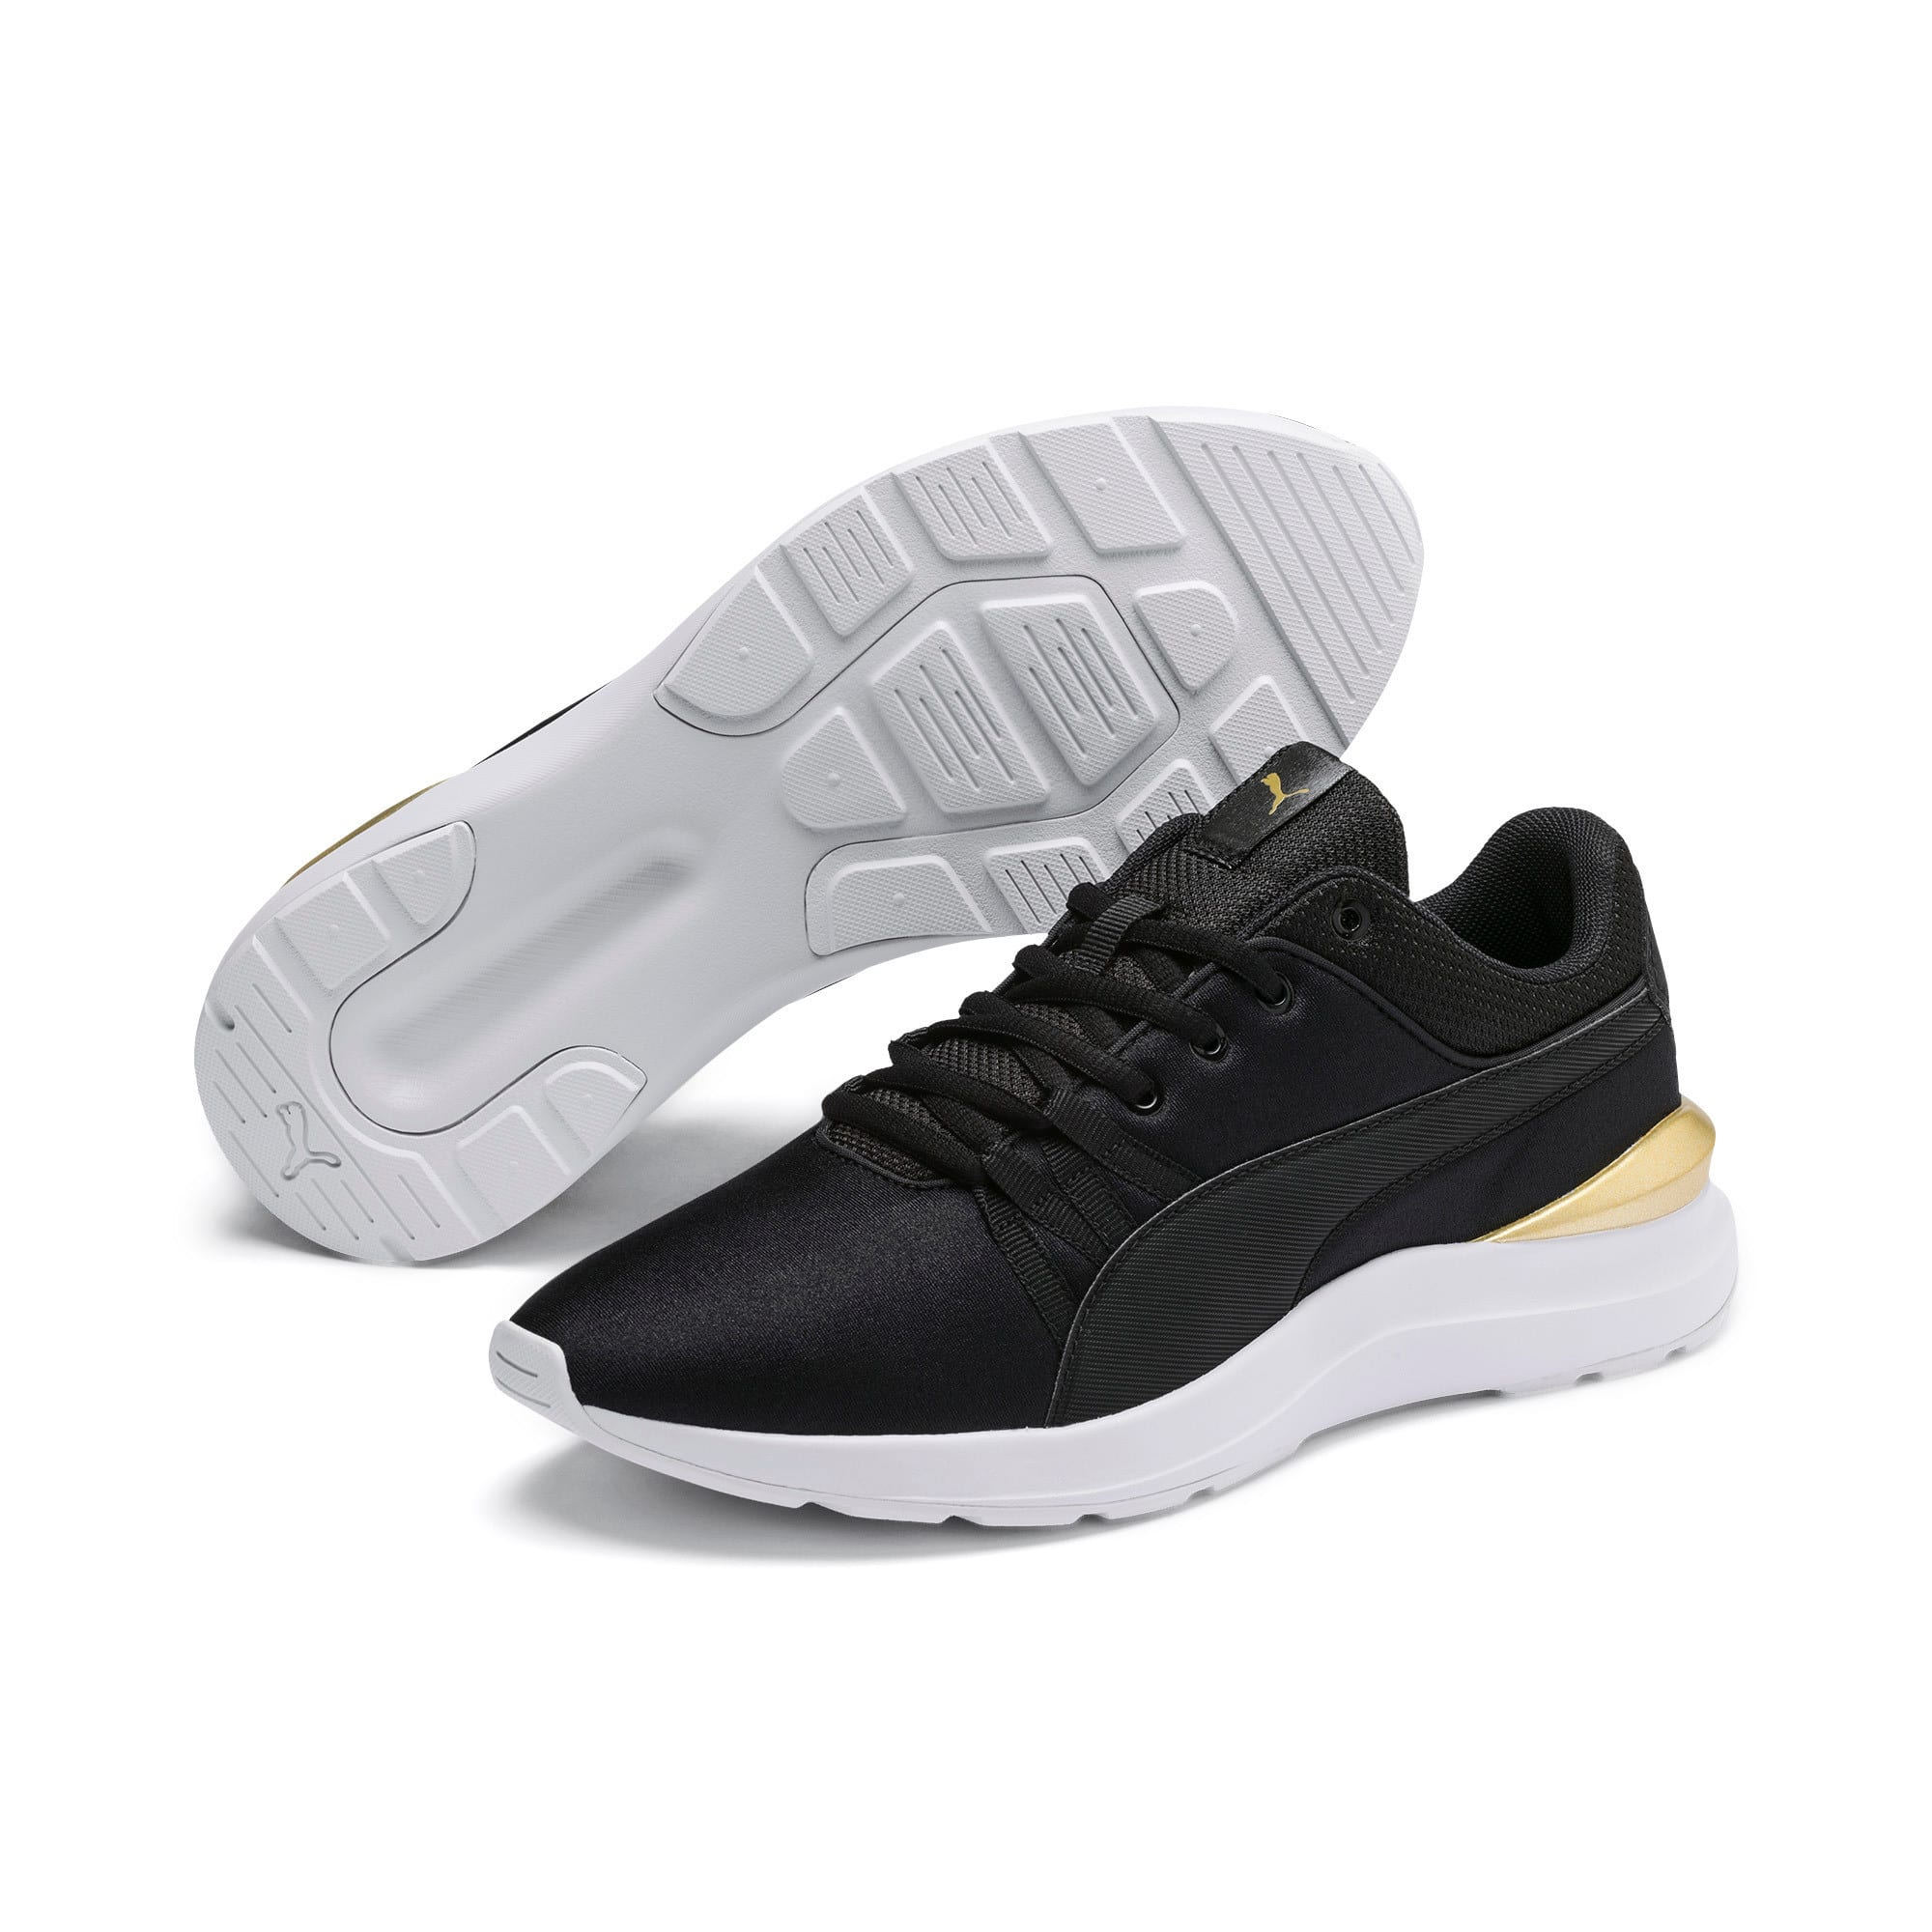 Thumbnail 2 of Adela Women's Sneakers, Puma Black - Puma Black, medium